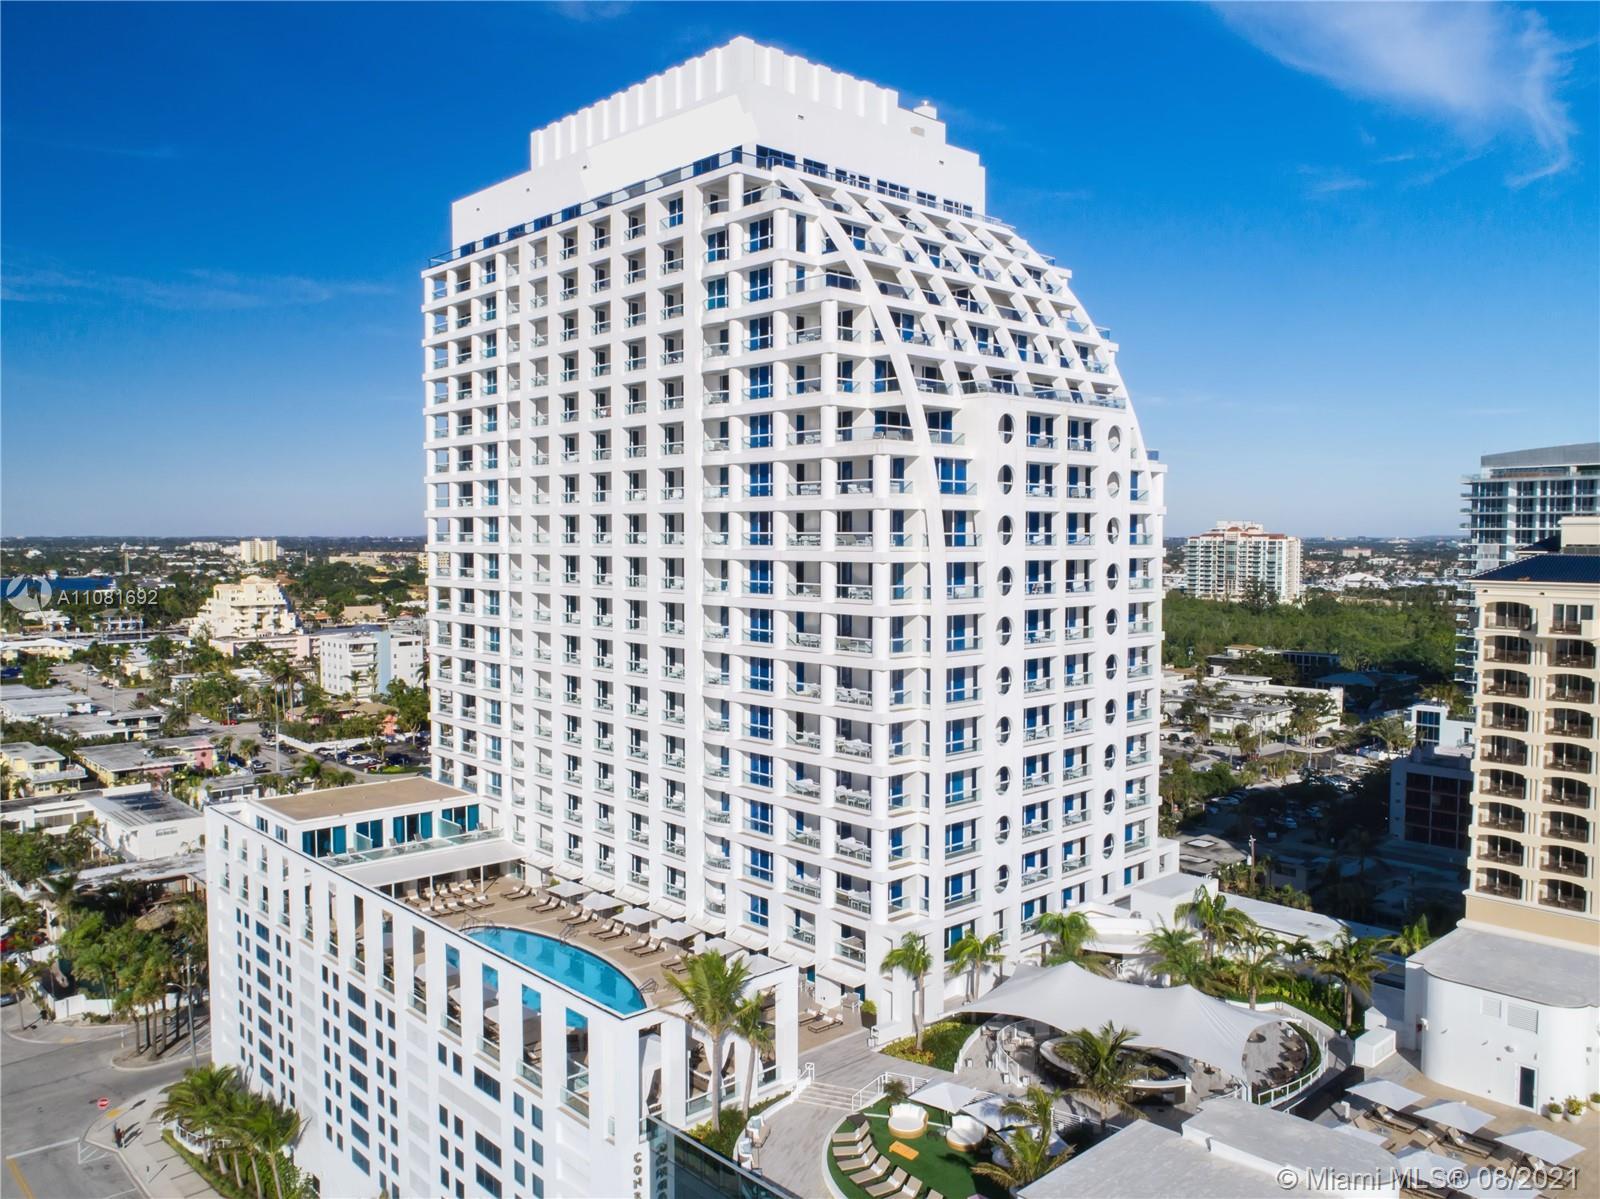 551 N Fort Lauderdale Beach Blvd #R1804 photo02